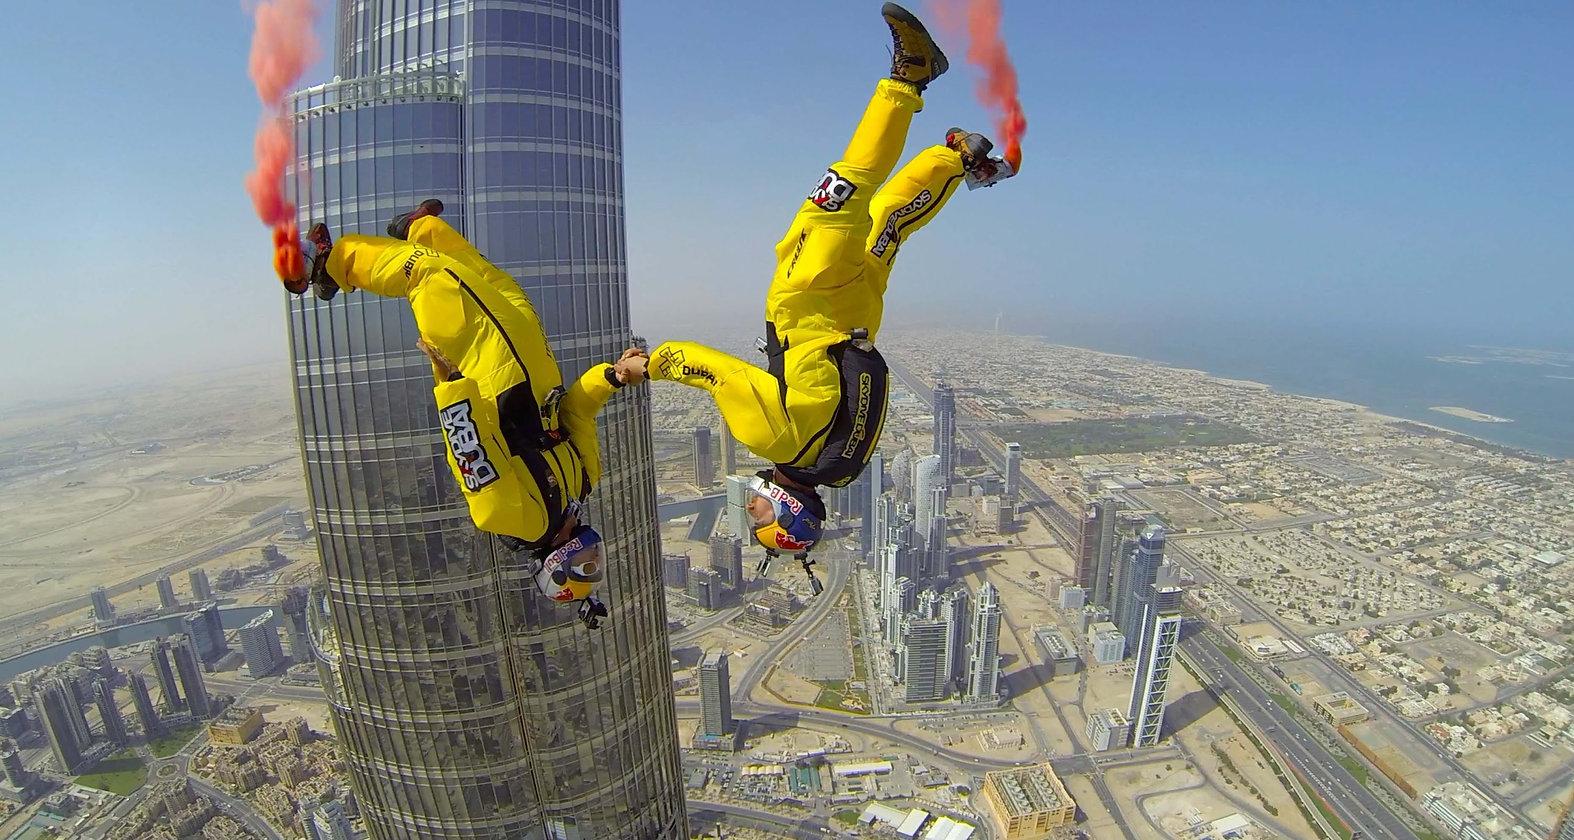 skydivers-set-world-record-by-ba.jpg